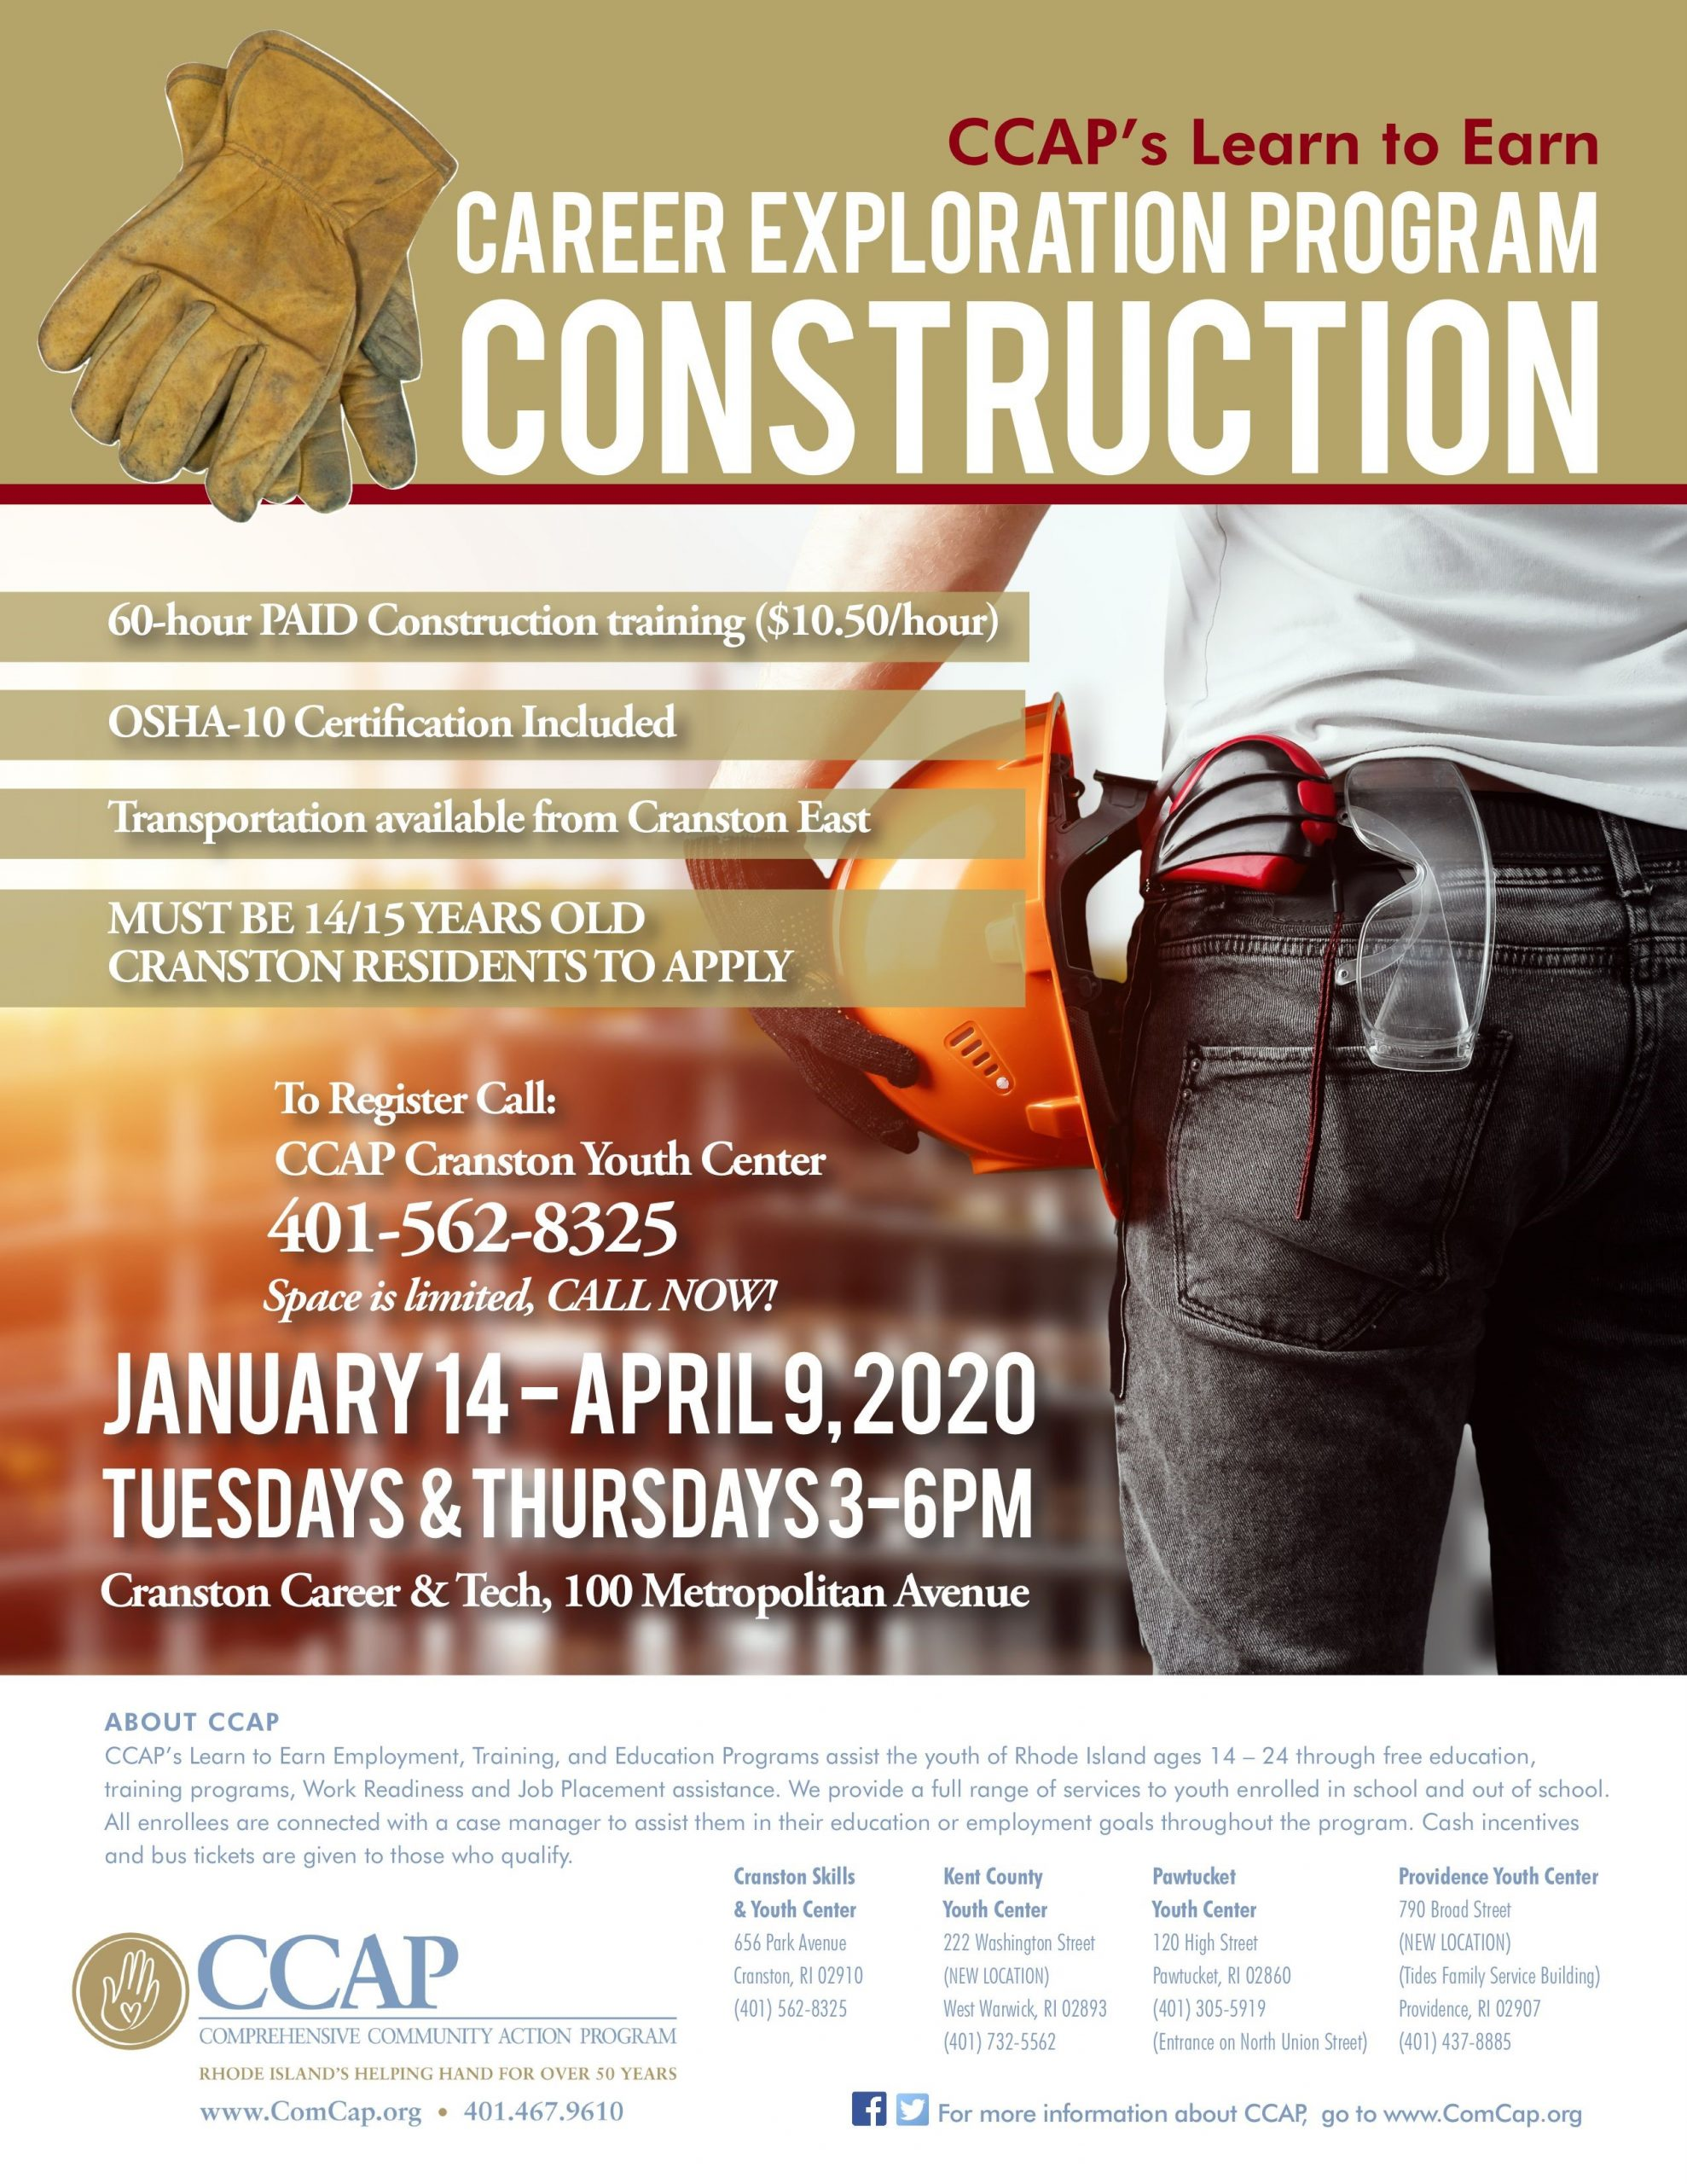 Ccap Announces Its Learn To Earn Paid Career Exploration Program Construction Comprehensive Community Action Program